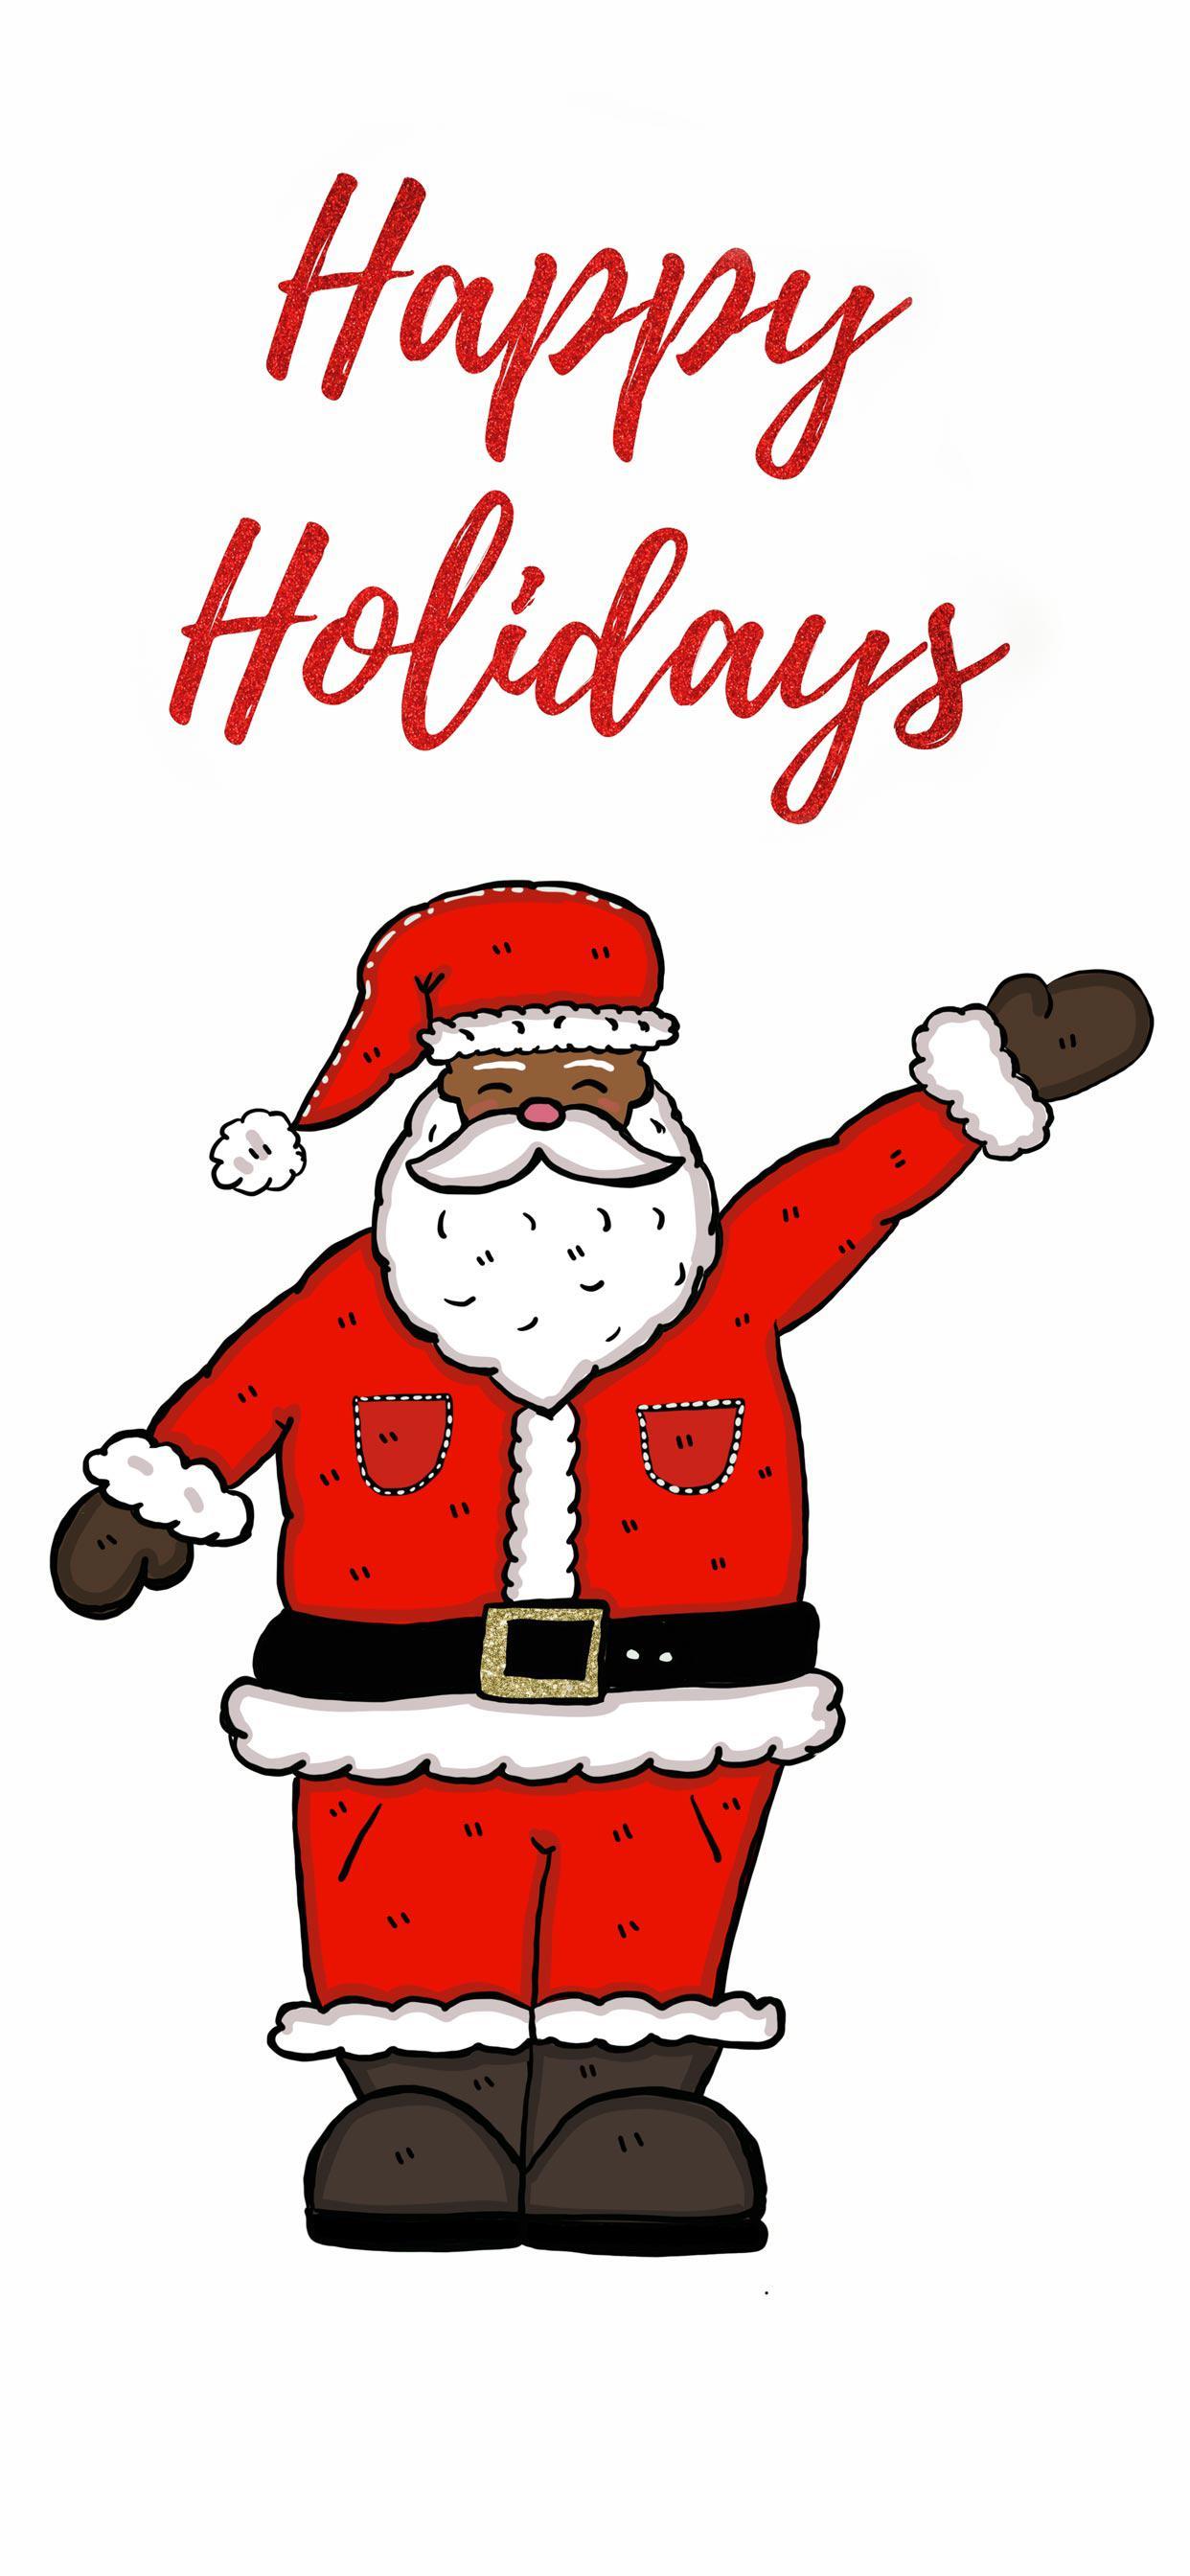 عکس زمینه تعطیلات کریسمسی بابانوئل پس زمینه